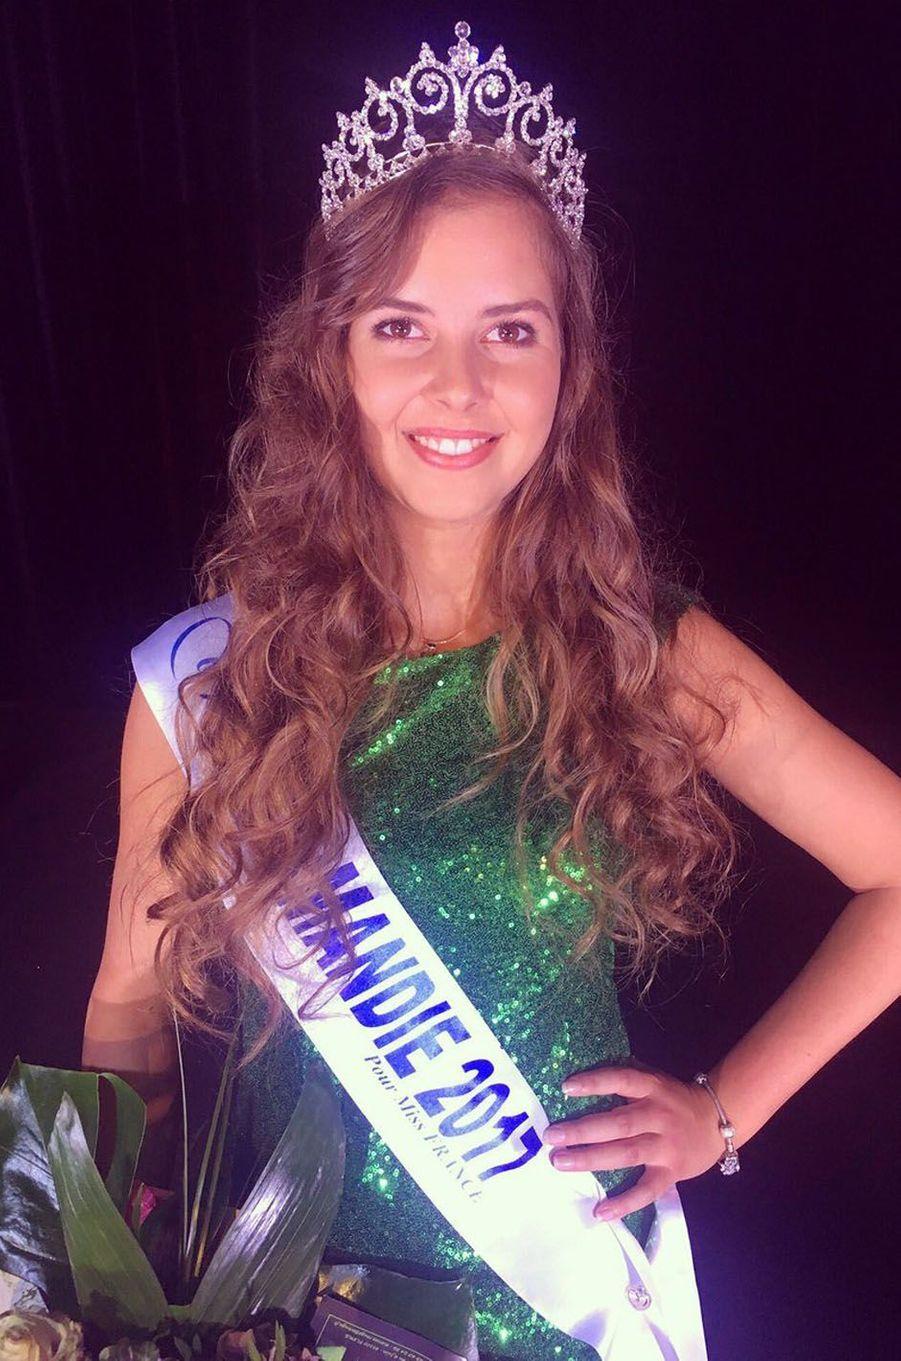 Alexane Dubourg, Miss Normandie 2017.